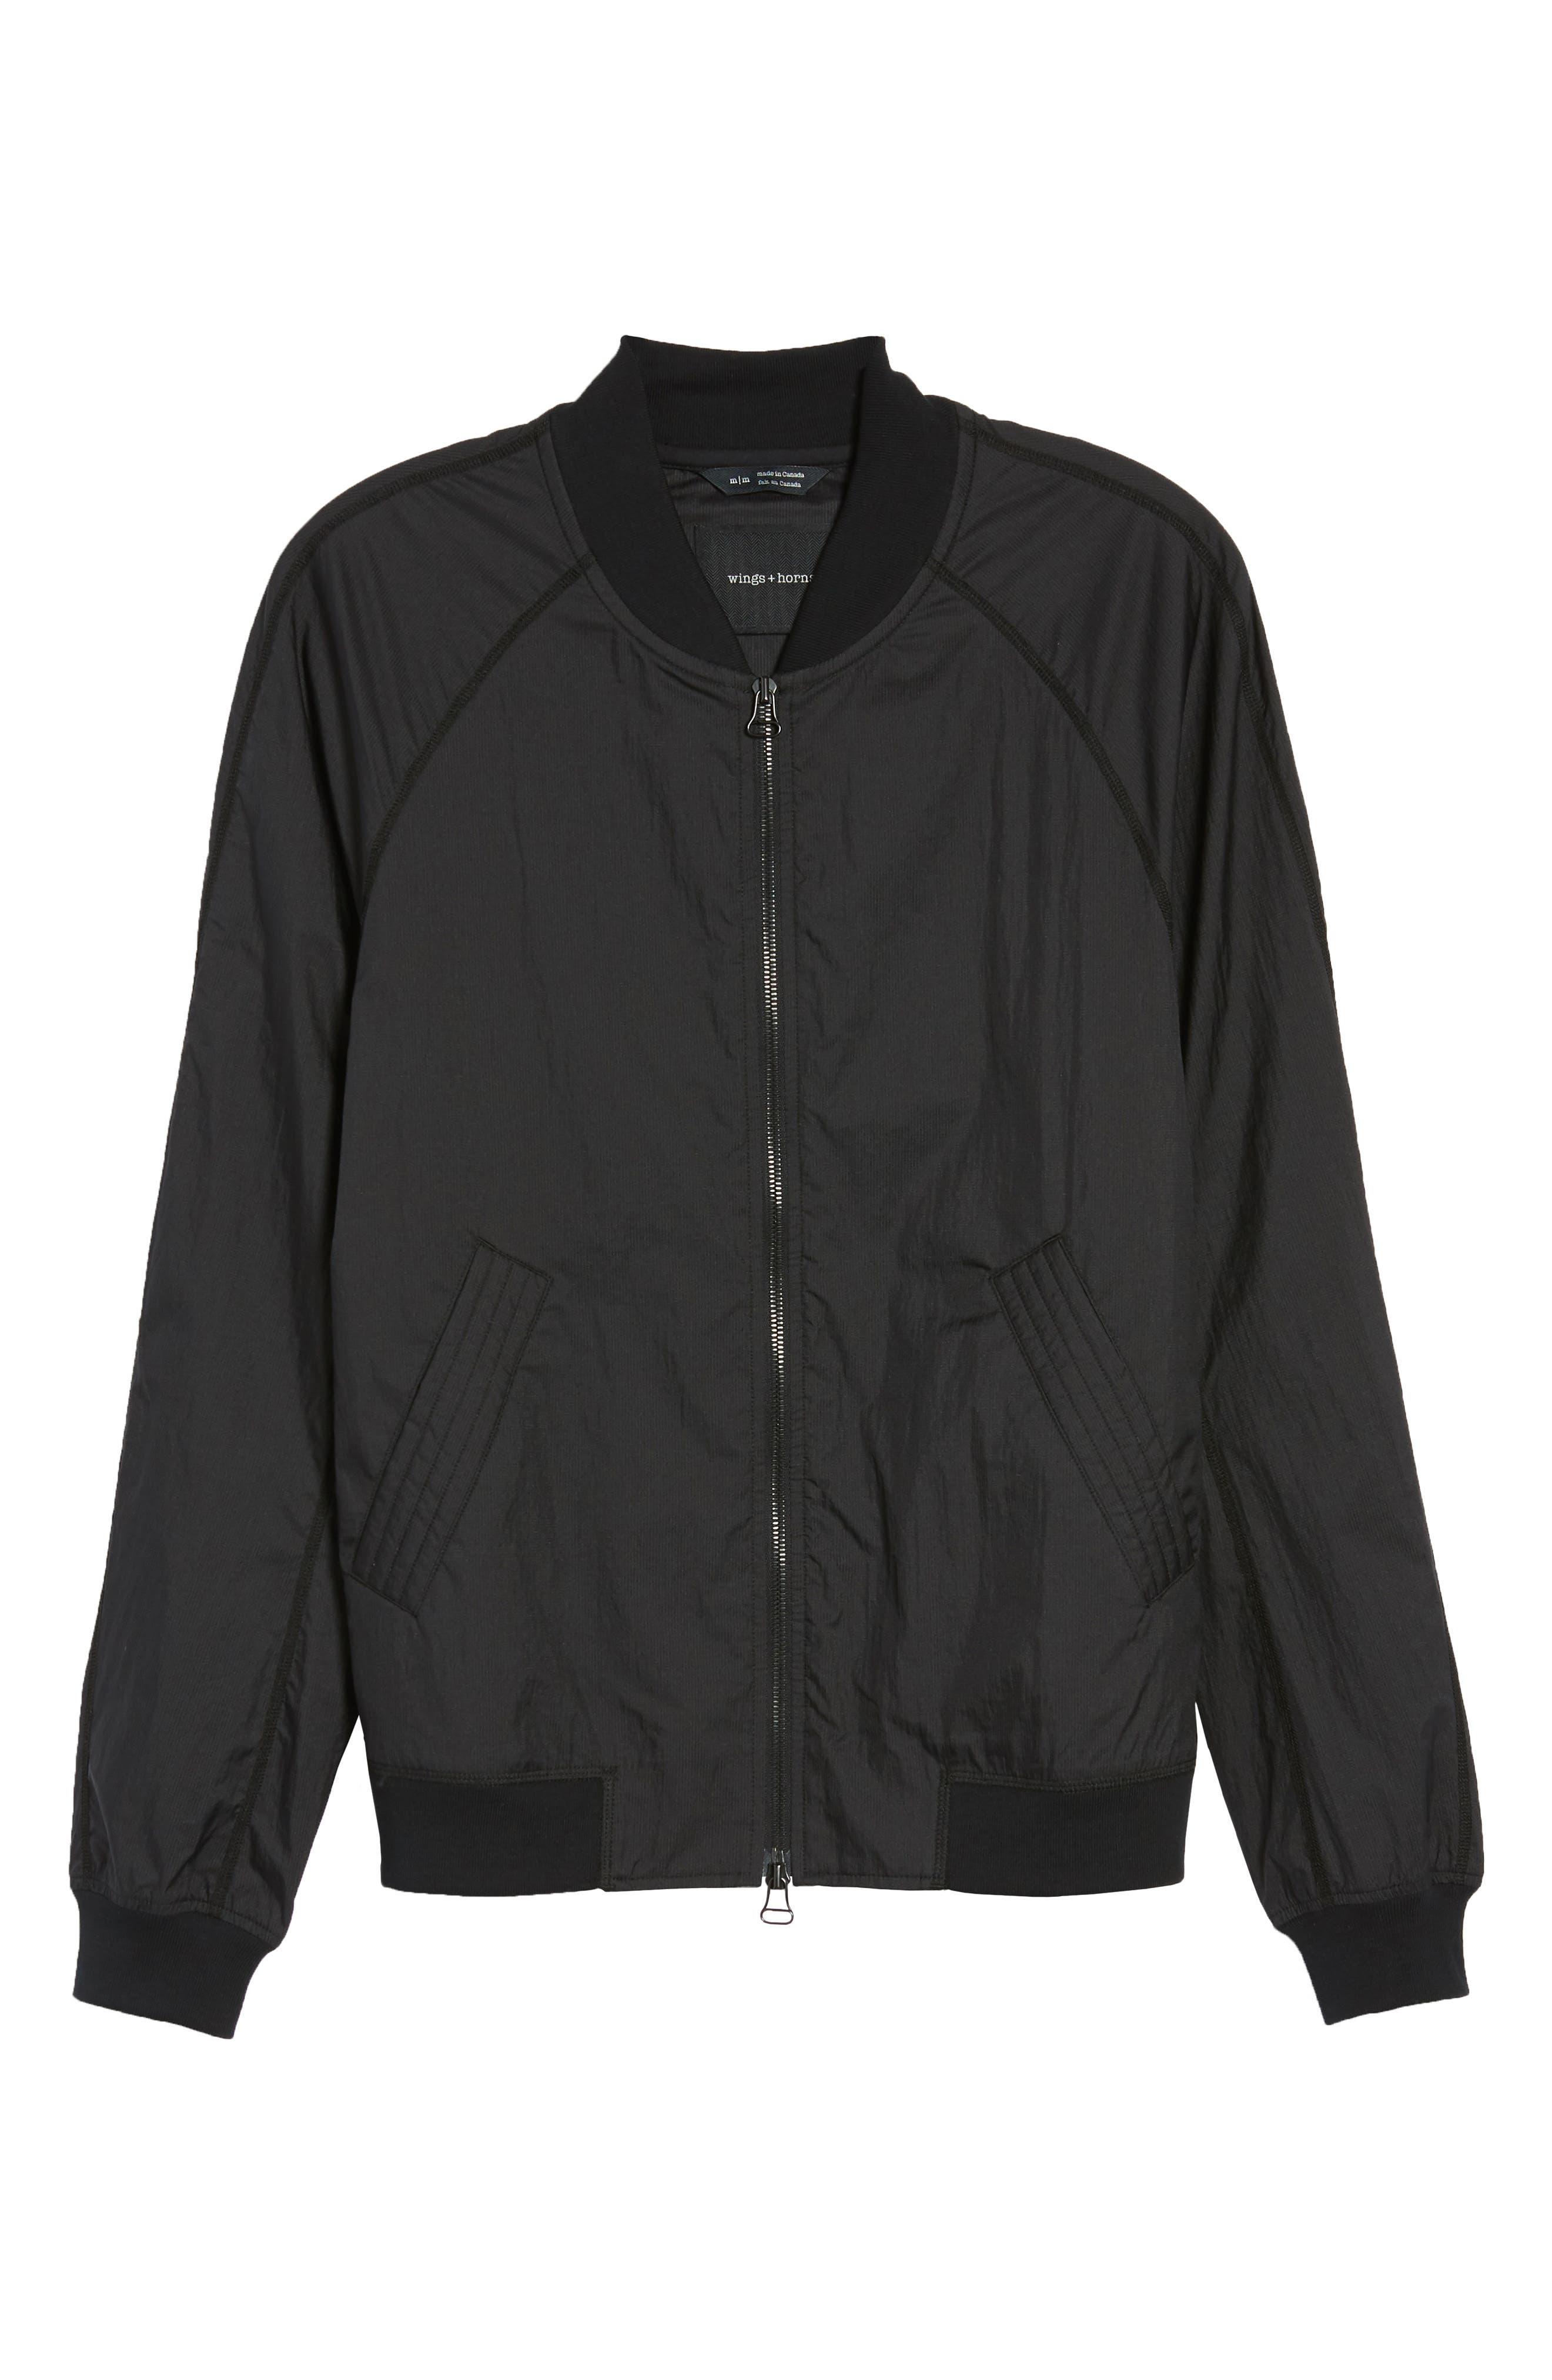 Souvenir Jacket,                             Alternate thumbnail 6, color,                             Black